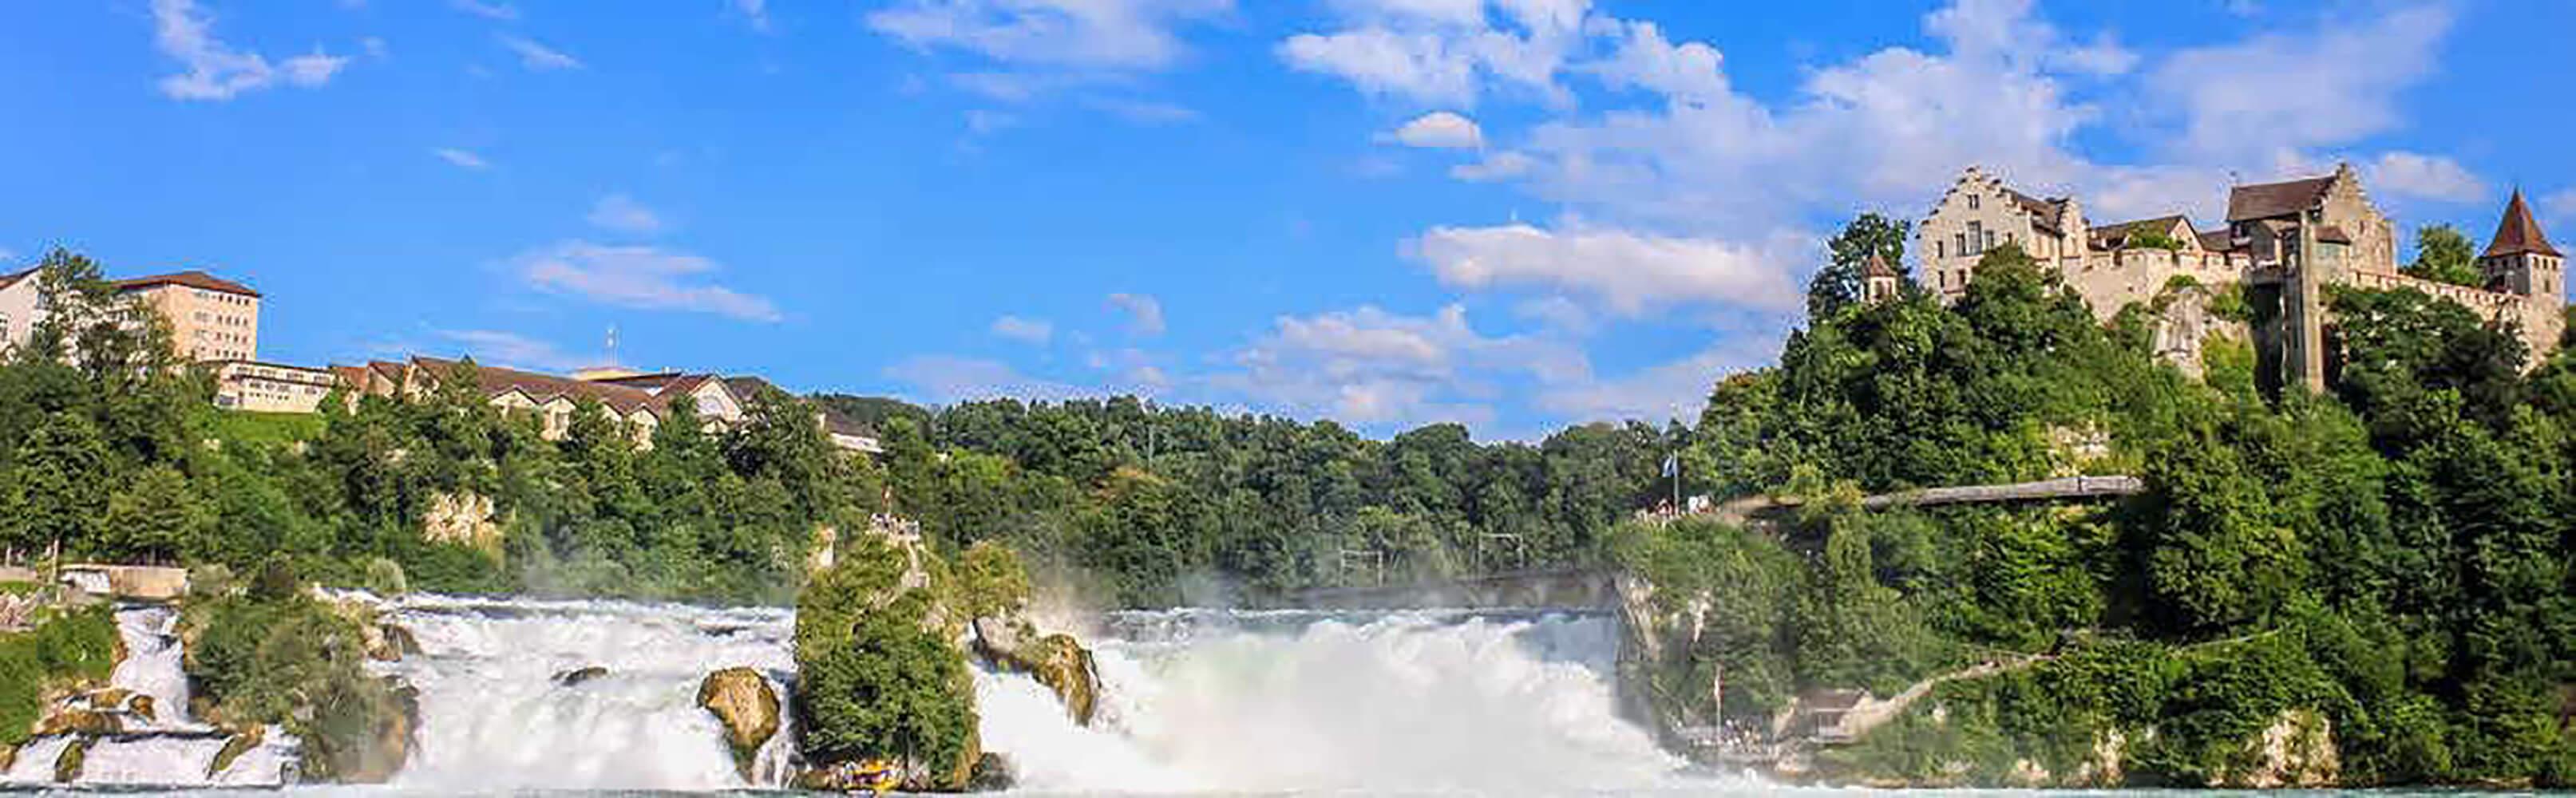 Rheinfall Aussichtsplattform - Neuhausen am Rheinfall 1